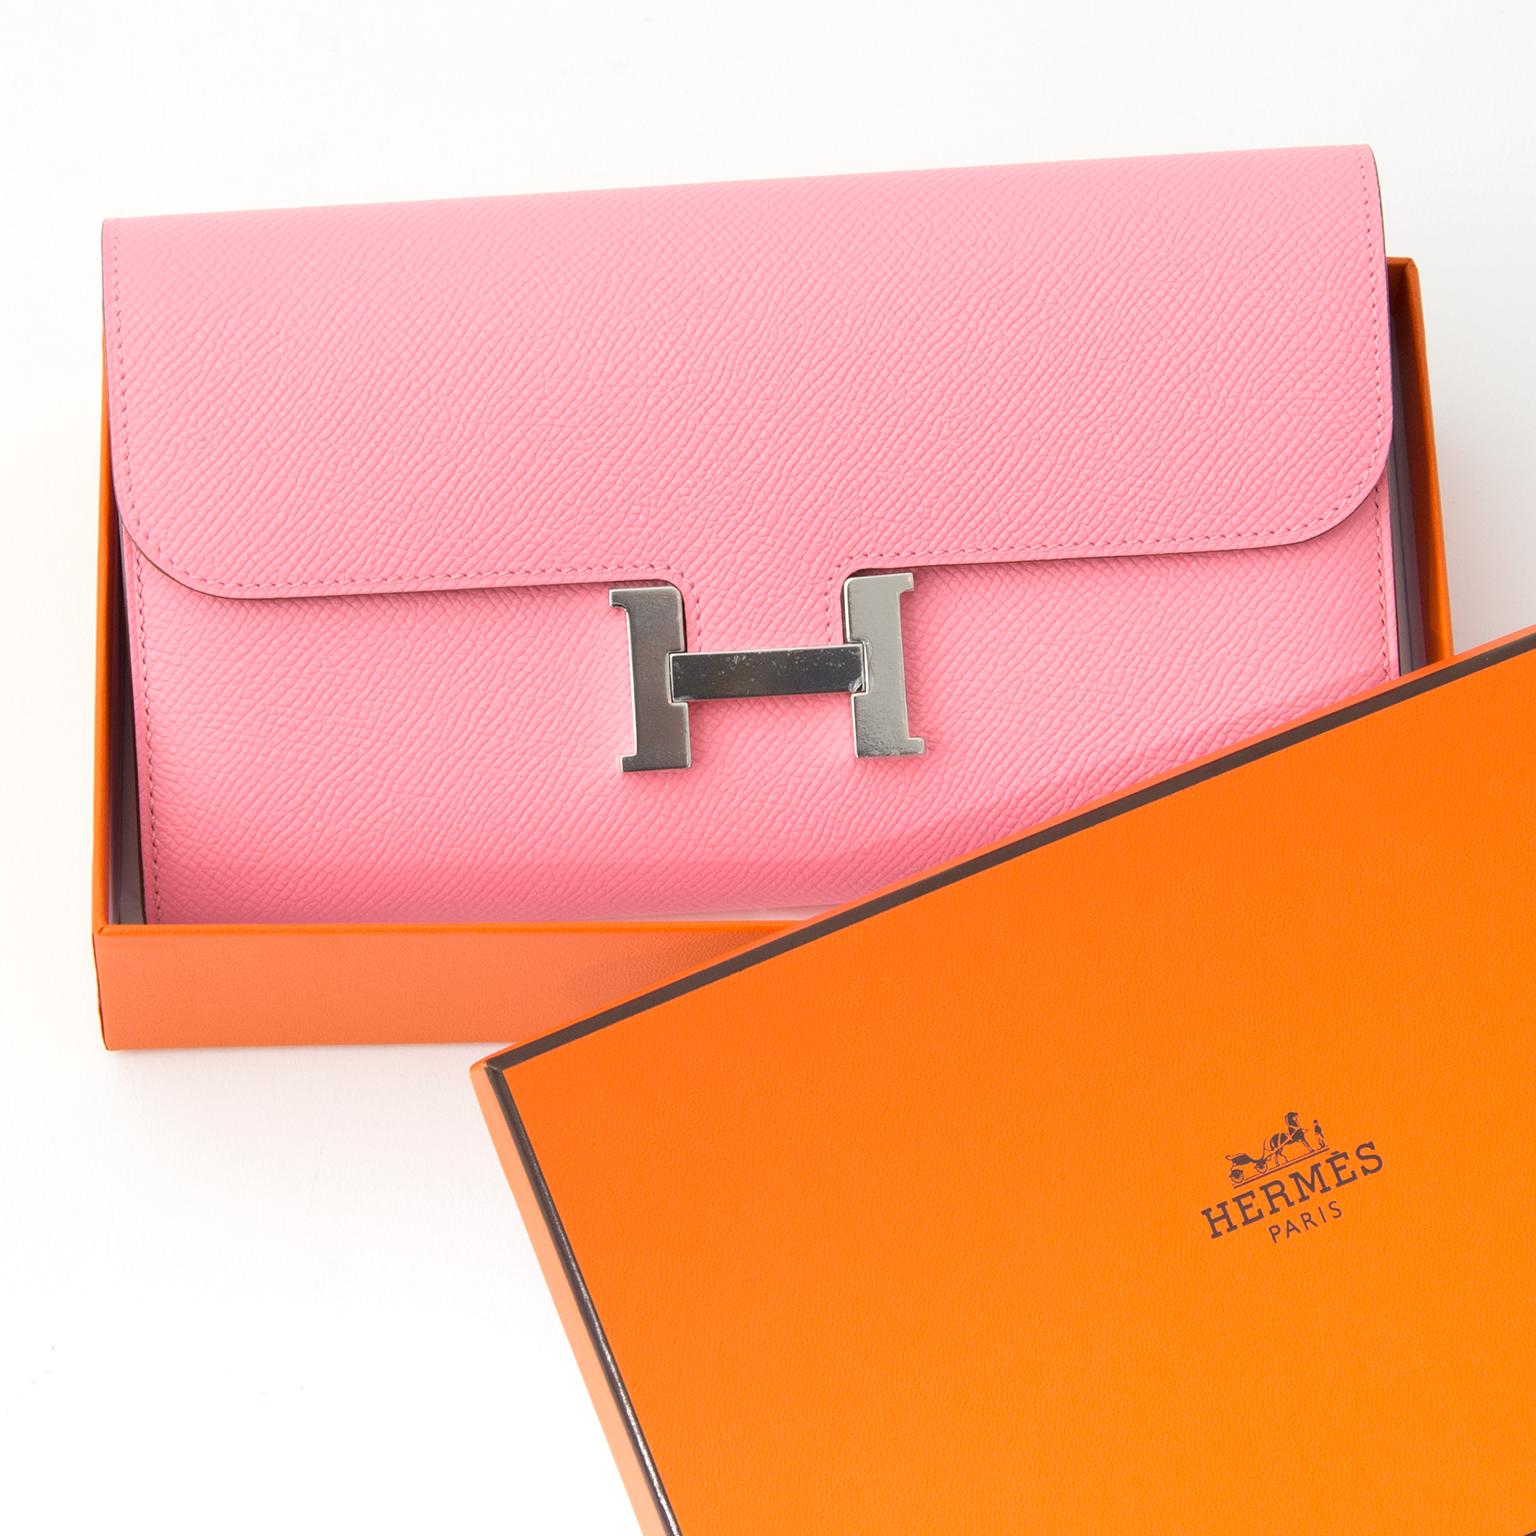 86da51449222 ... koop snel en veilig online tweedehands BRAND NEW Hermes Constance Long  Wallet Veau Epsom Rose Confetti